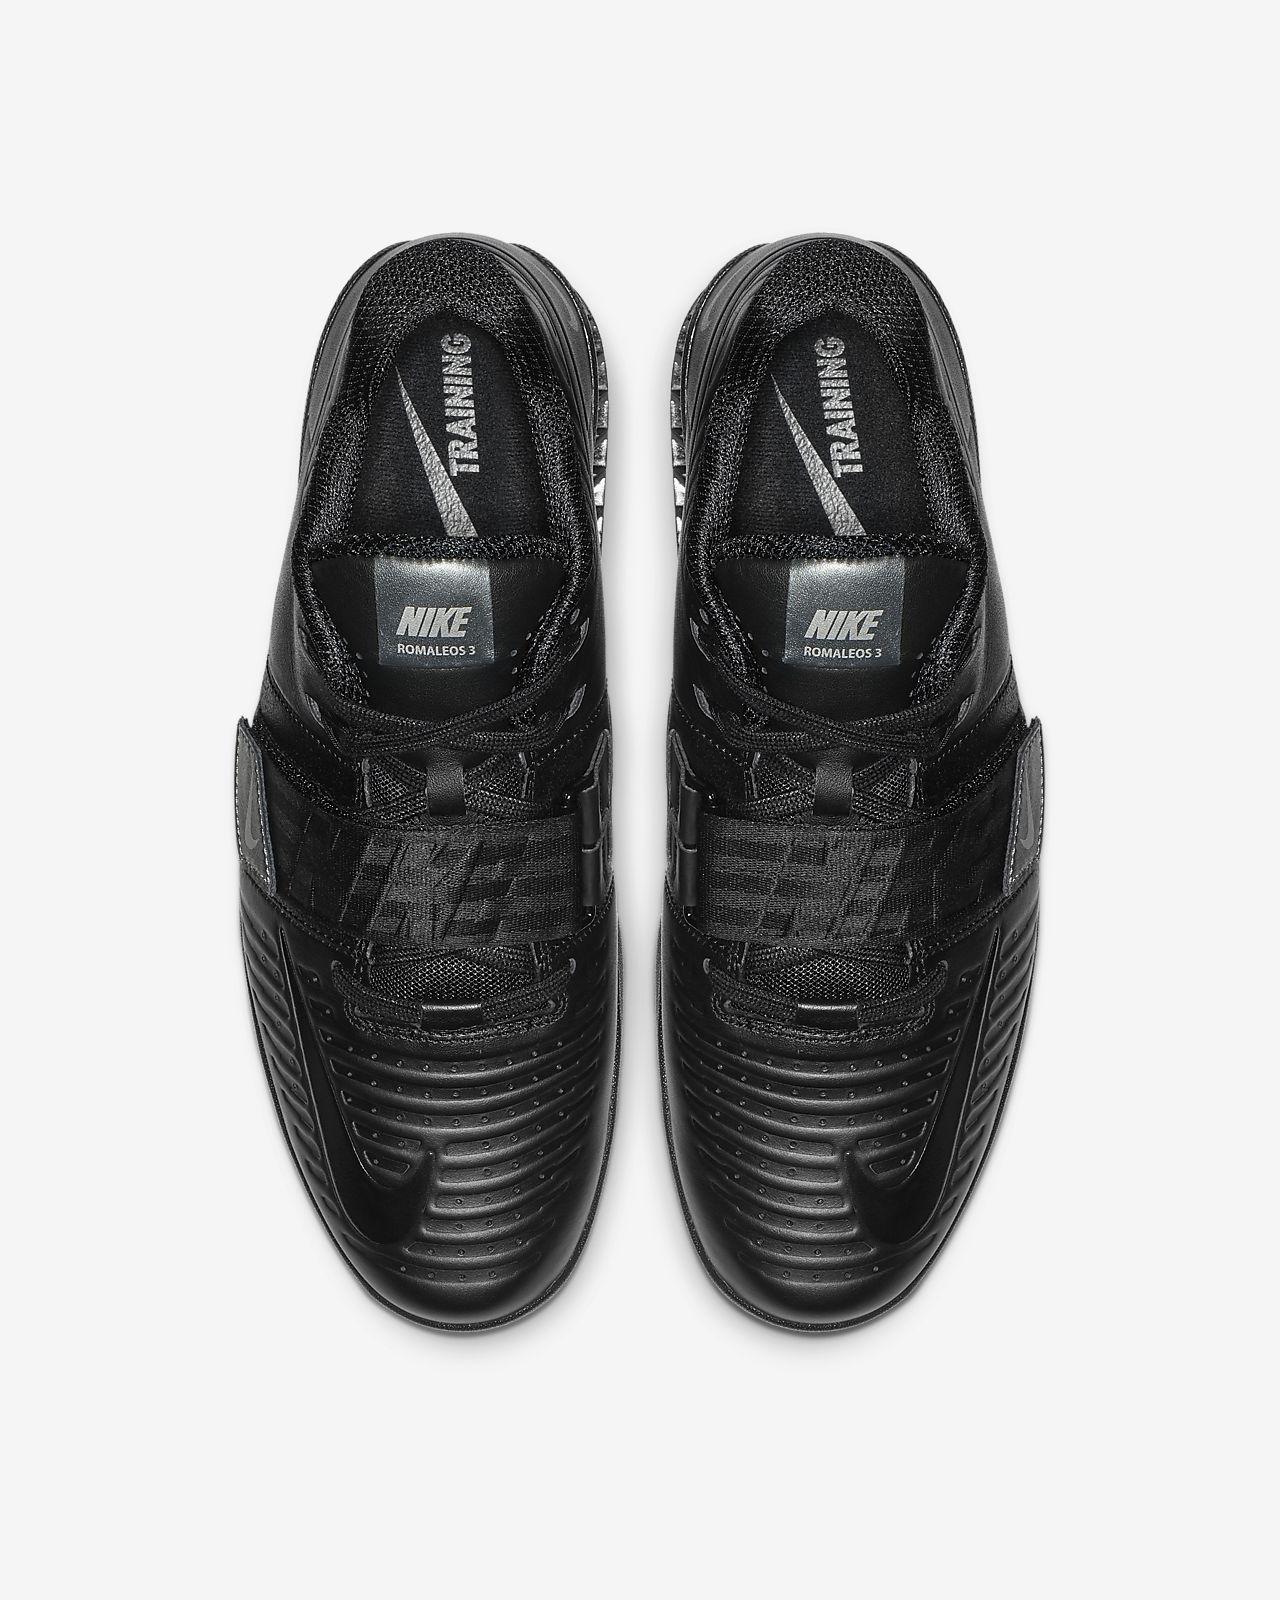 5f1b4cc9d5f4 Nike Romaleos 3 XD Training Shoe. Nike.com IN